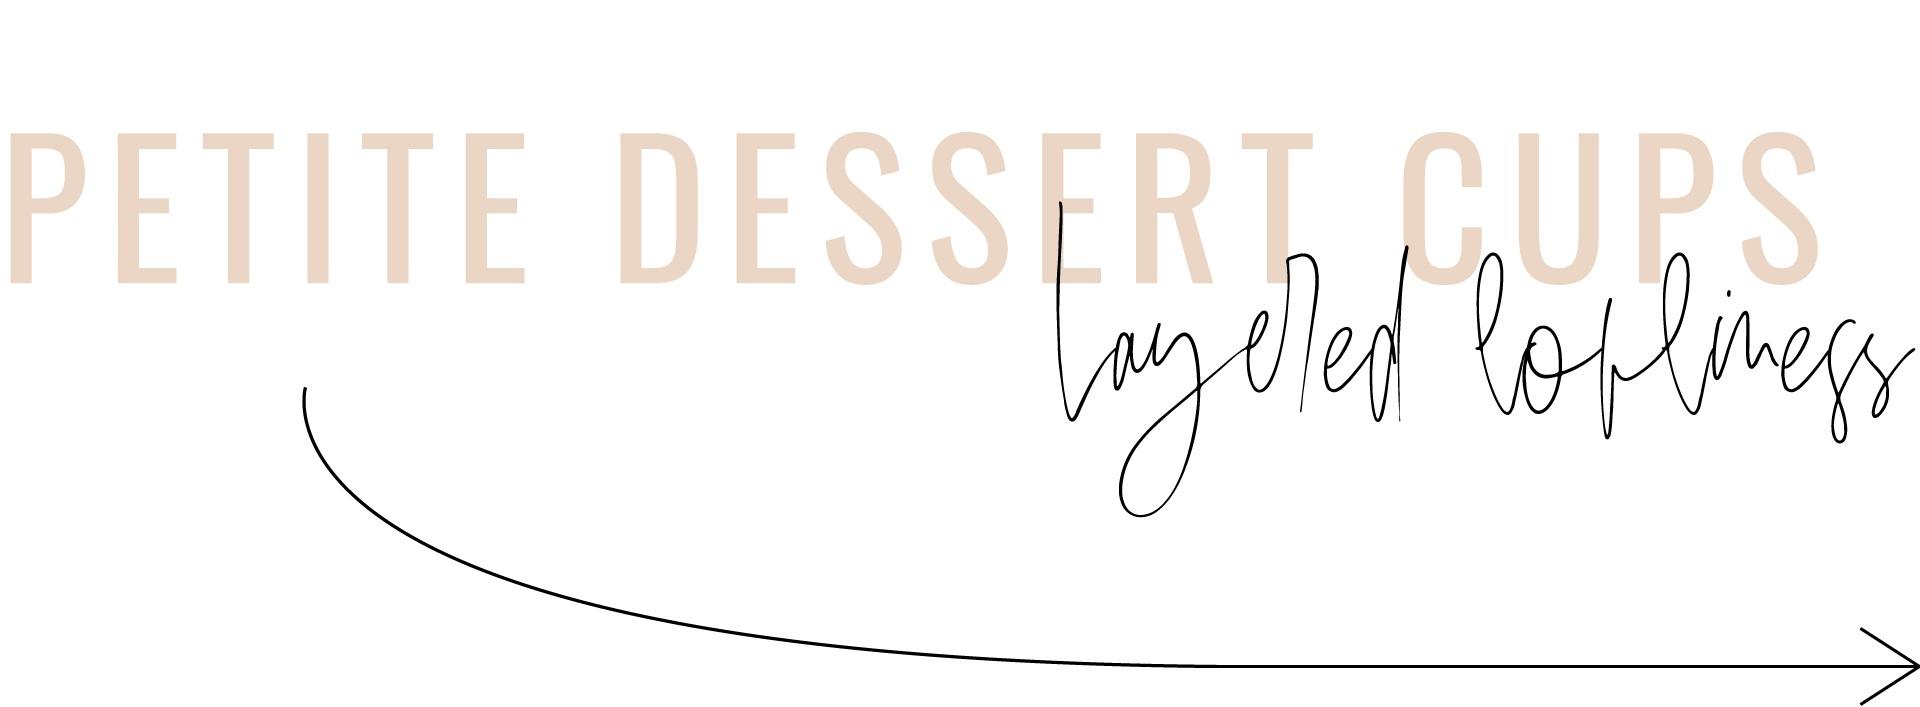 Custom+Petite-Dessert-Cups+Orange+County+Bakery+Wedding+Party.jpg